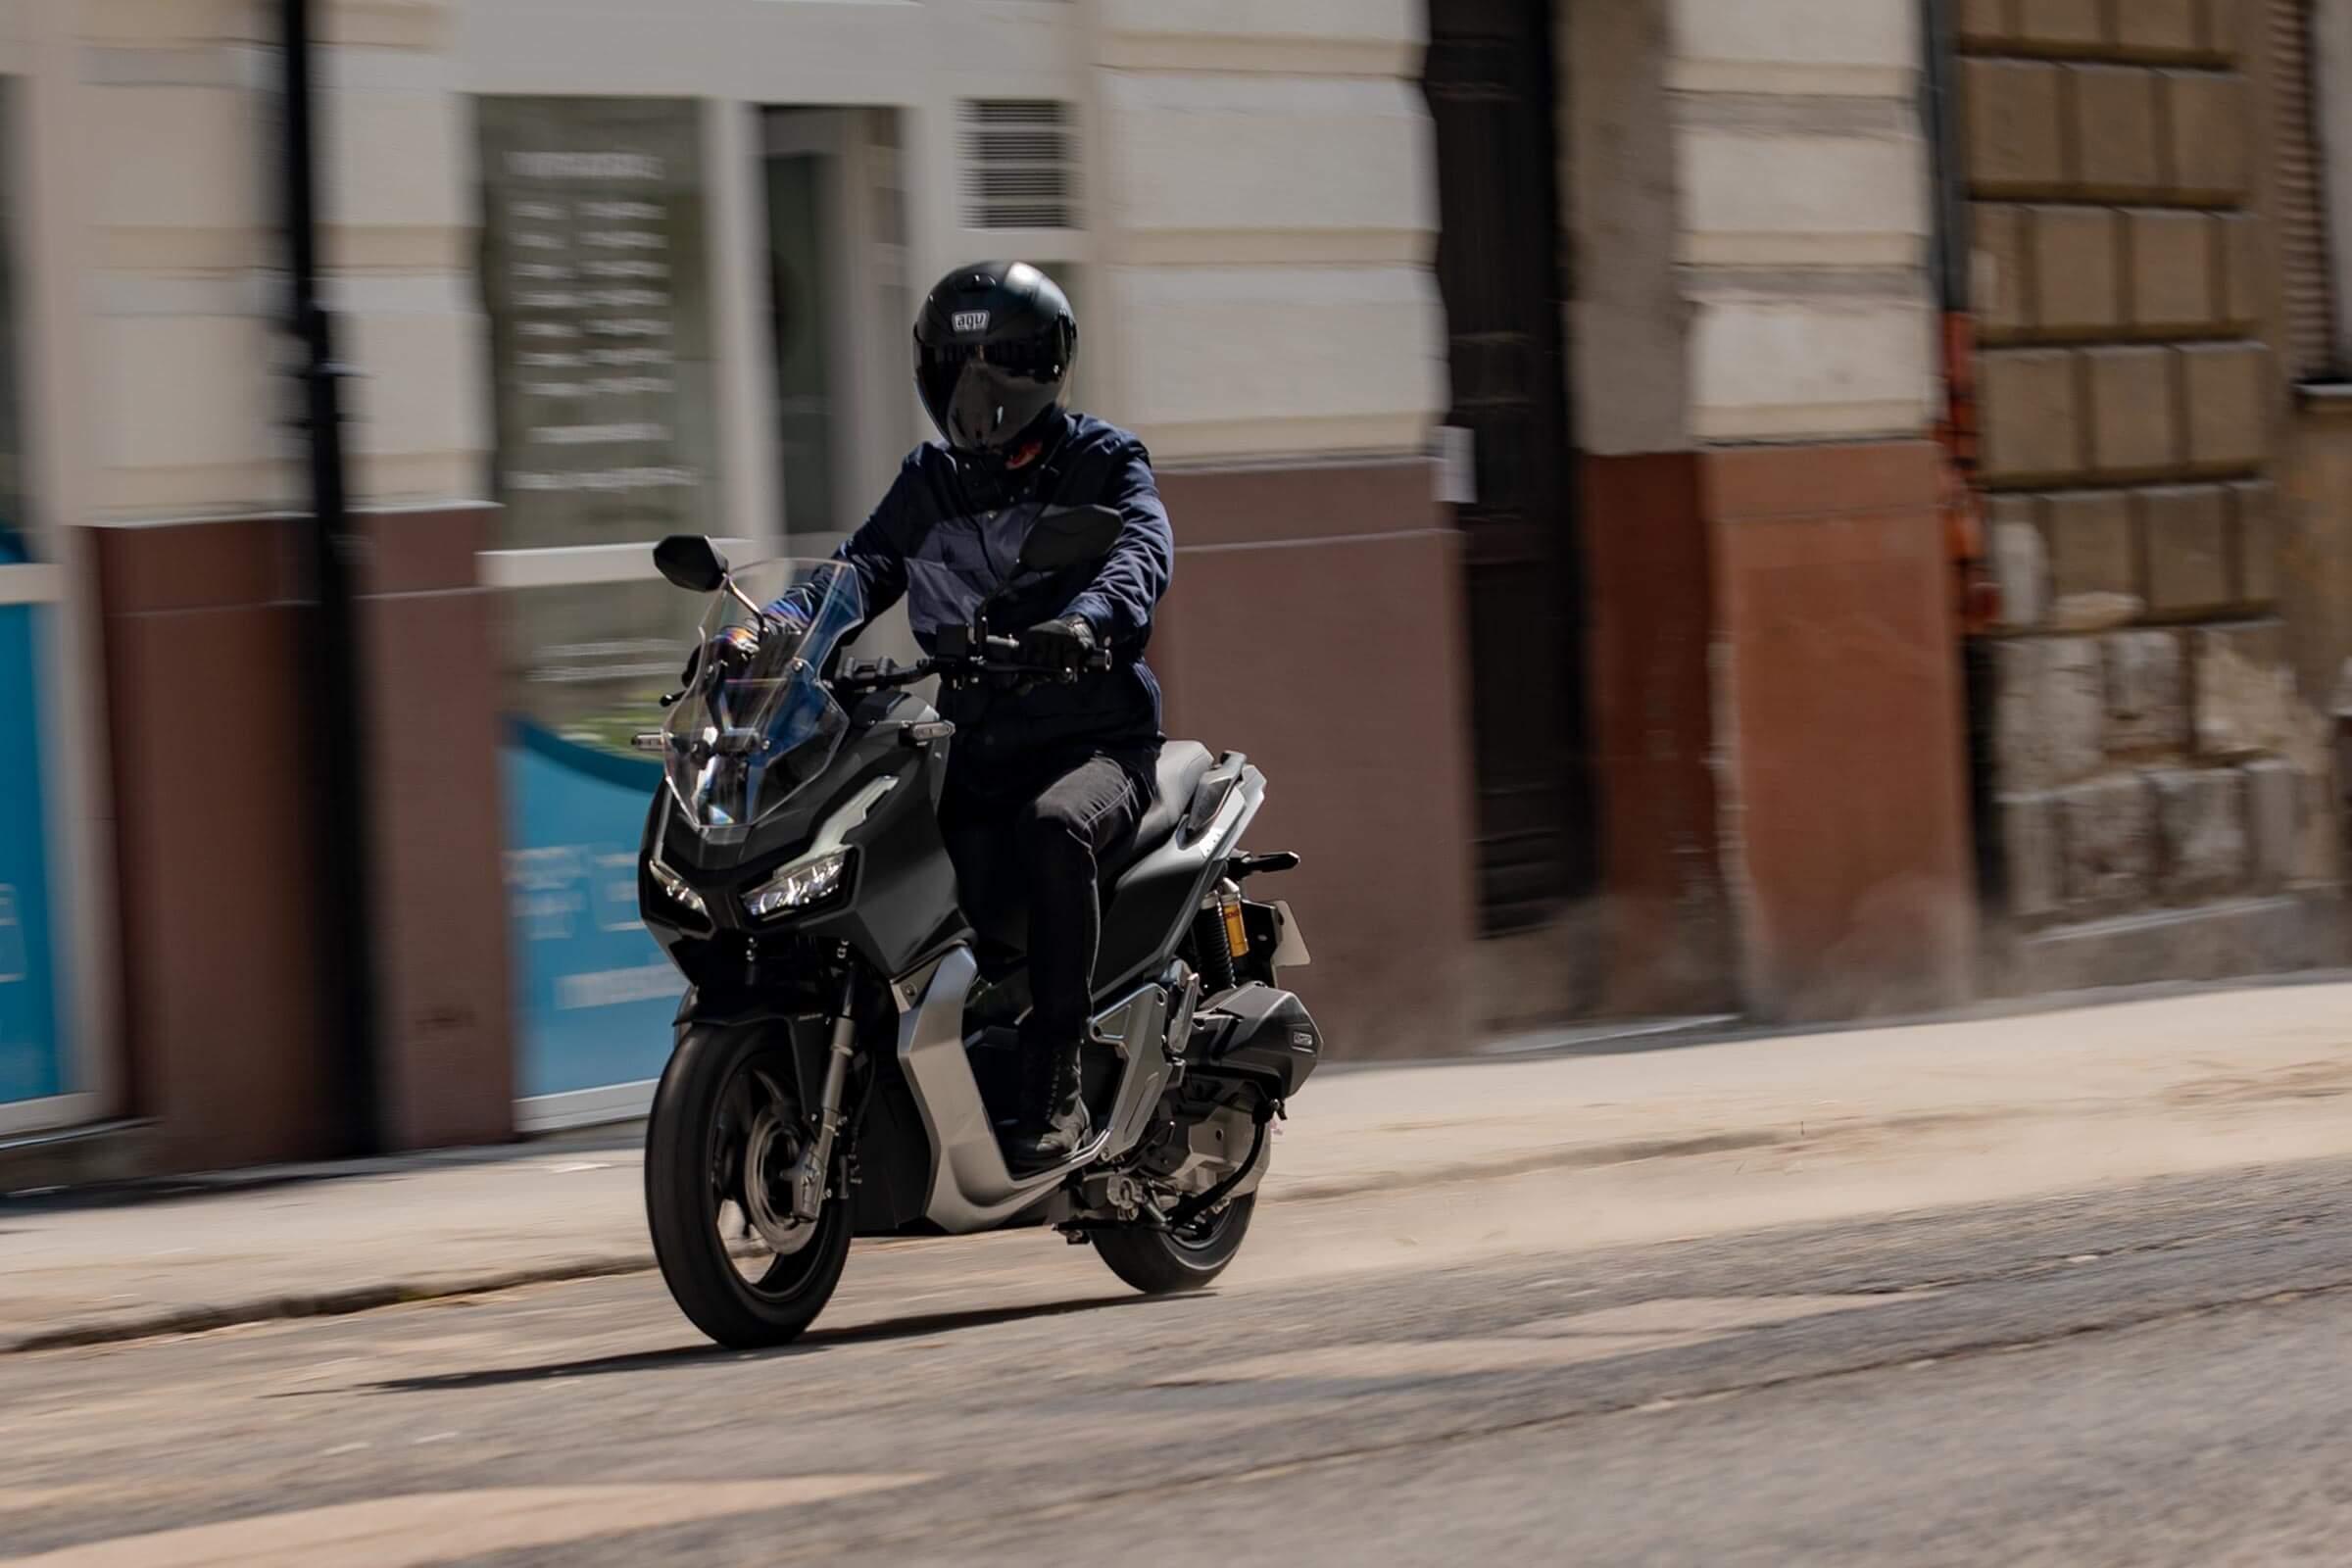 2021 Honda ADV 150 at Sloans Motorcycle ATV, Murfreesboro, TN, 37129